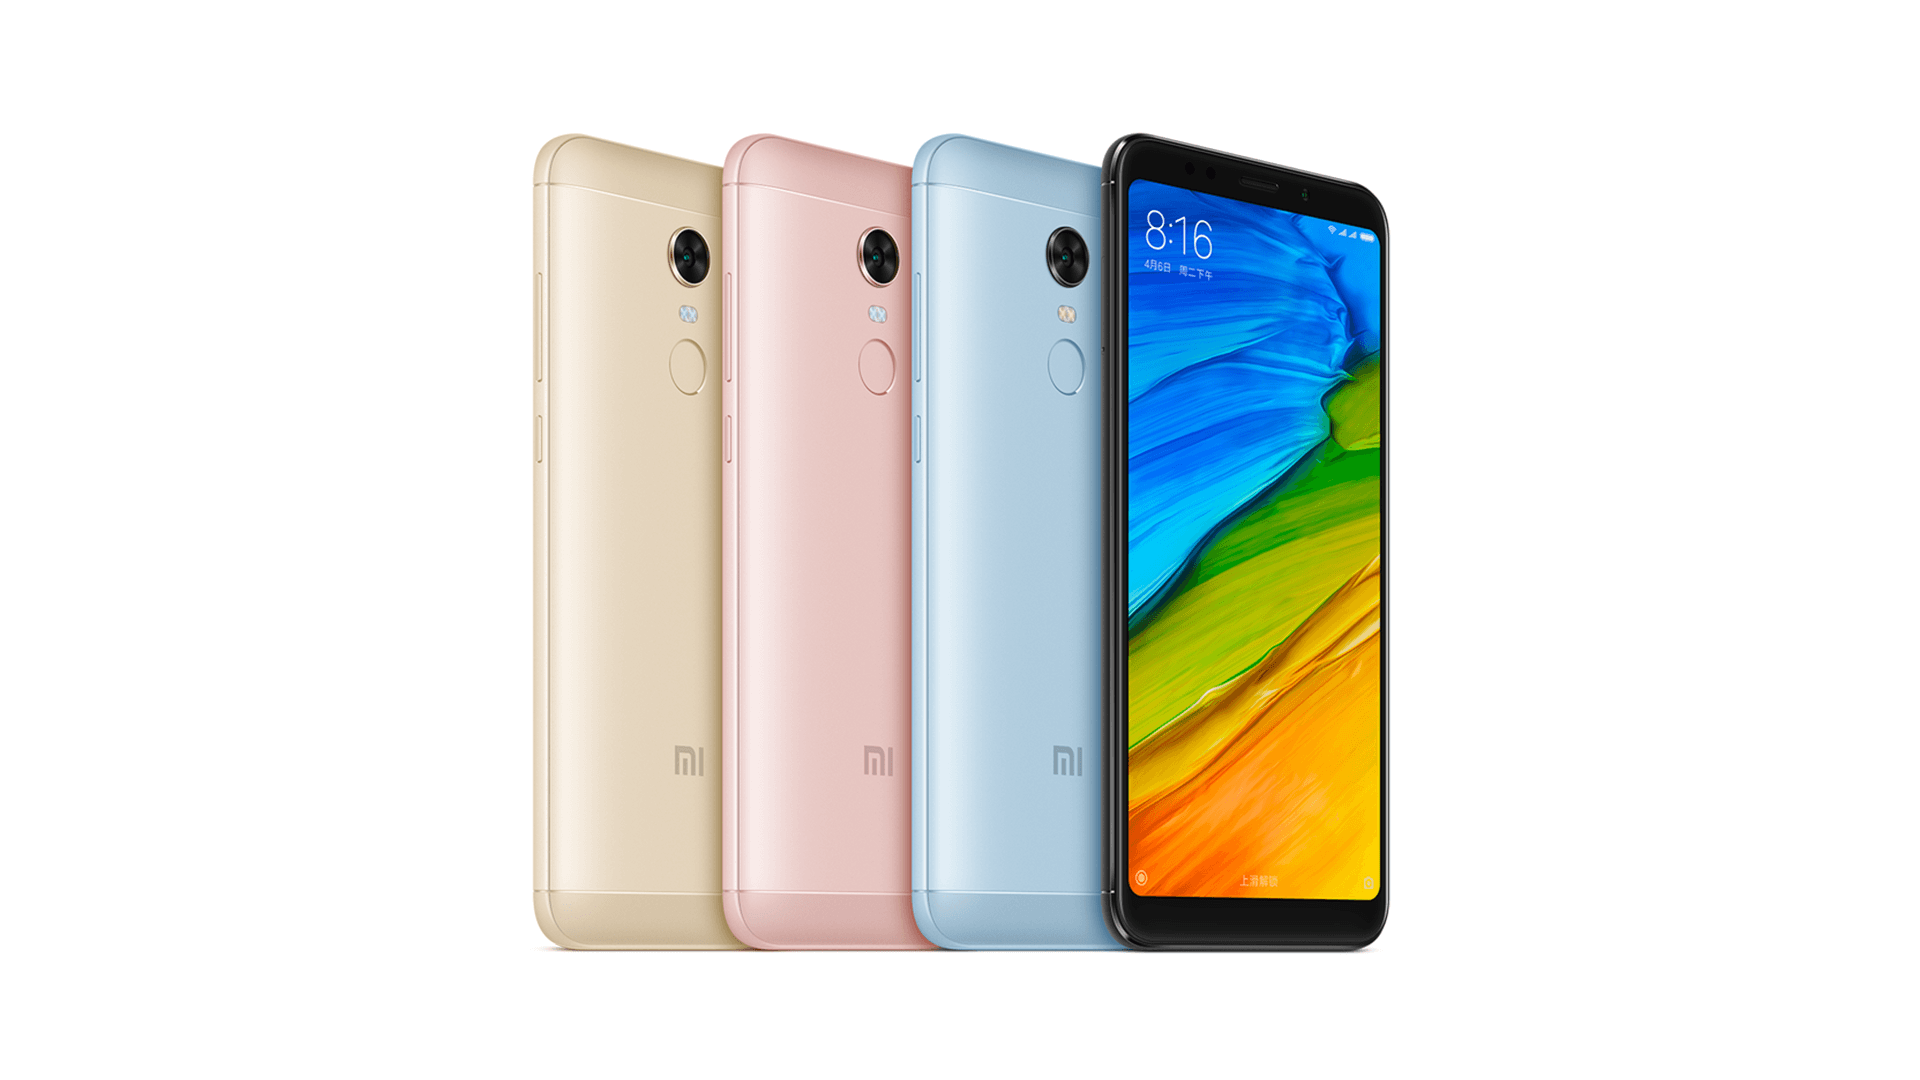 Xiaomi Redmi 5 Plus Wallpapers: Le Bon Plan Du Jour : Le Xiaomi Redmi Note 5 (Redmi 5 Plus